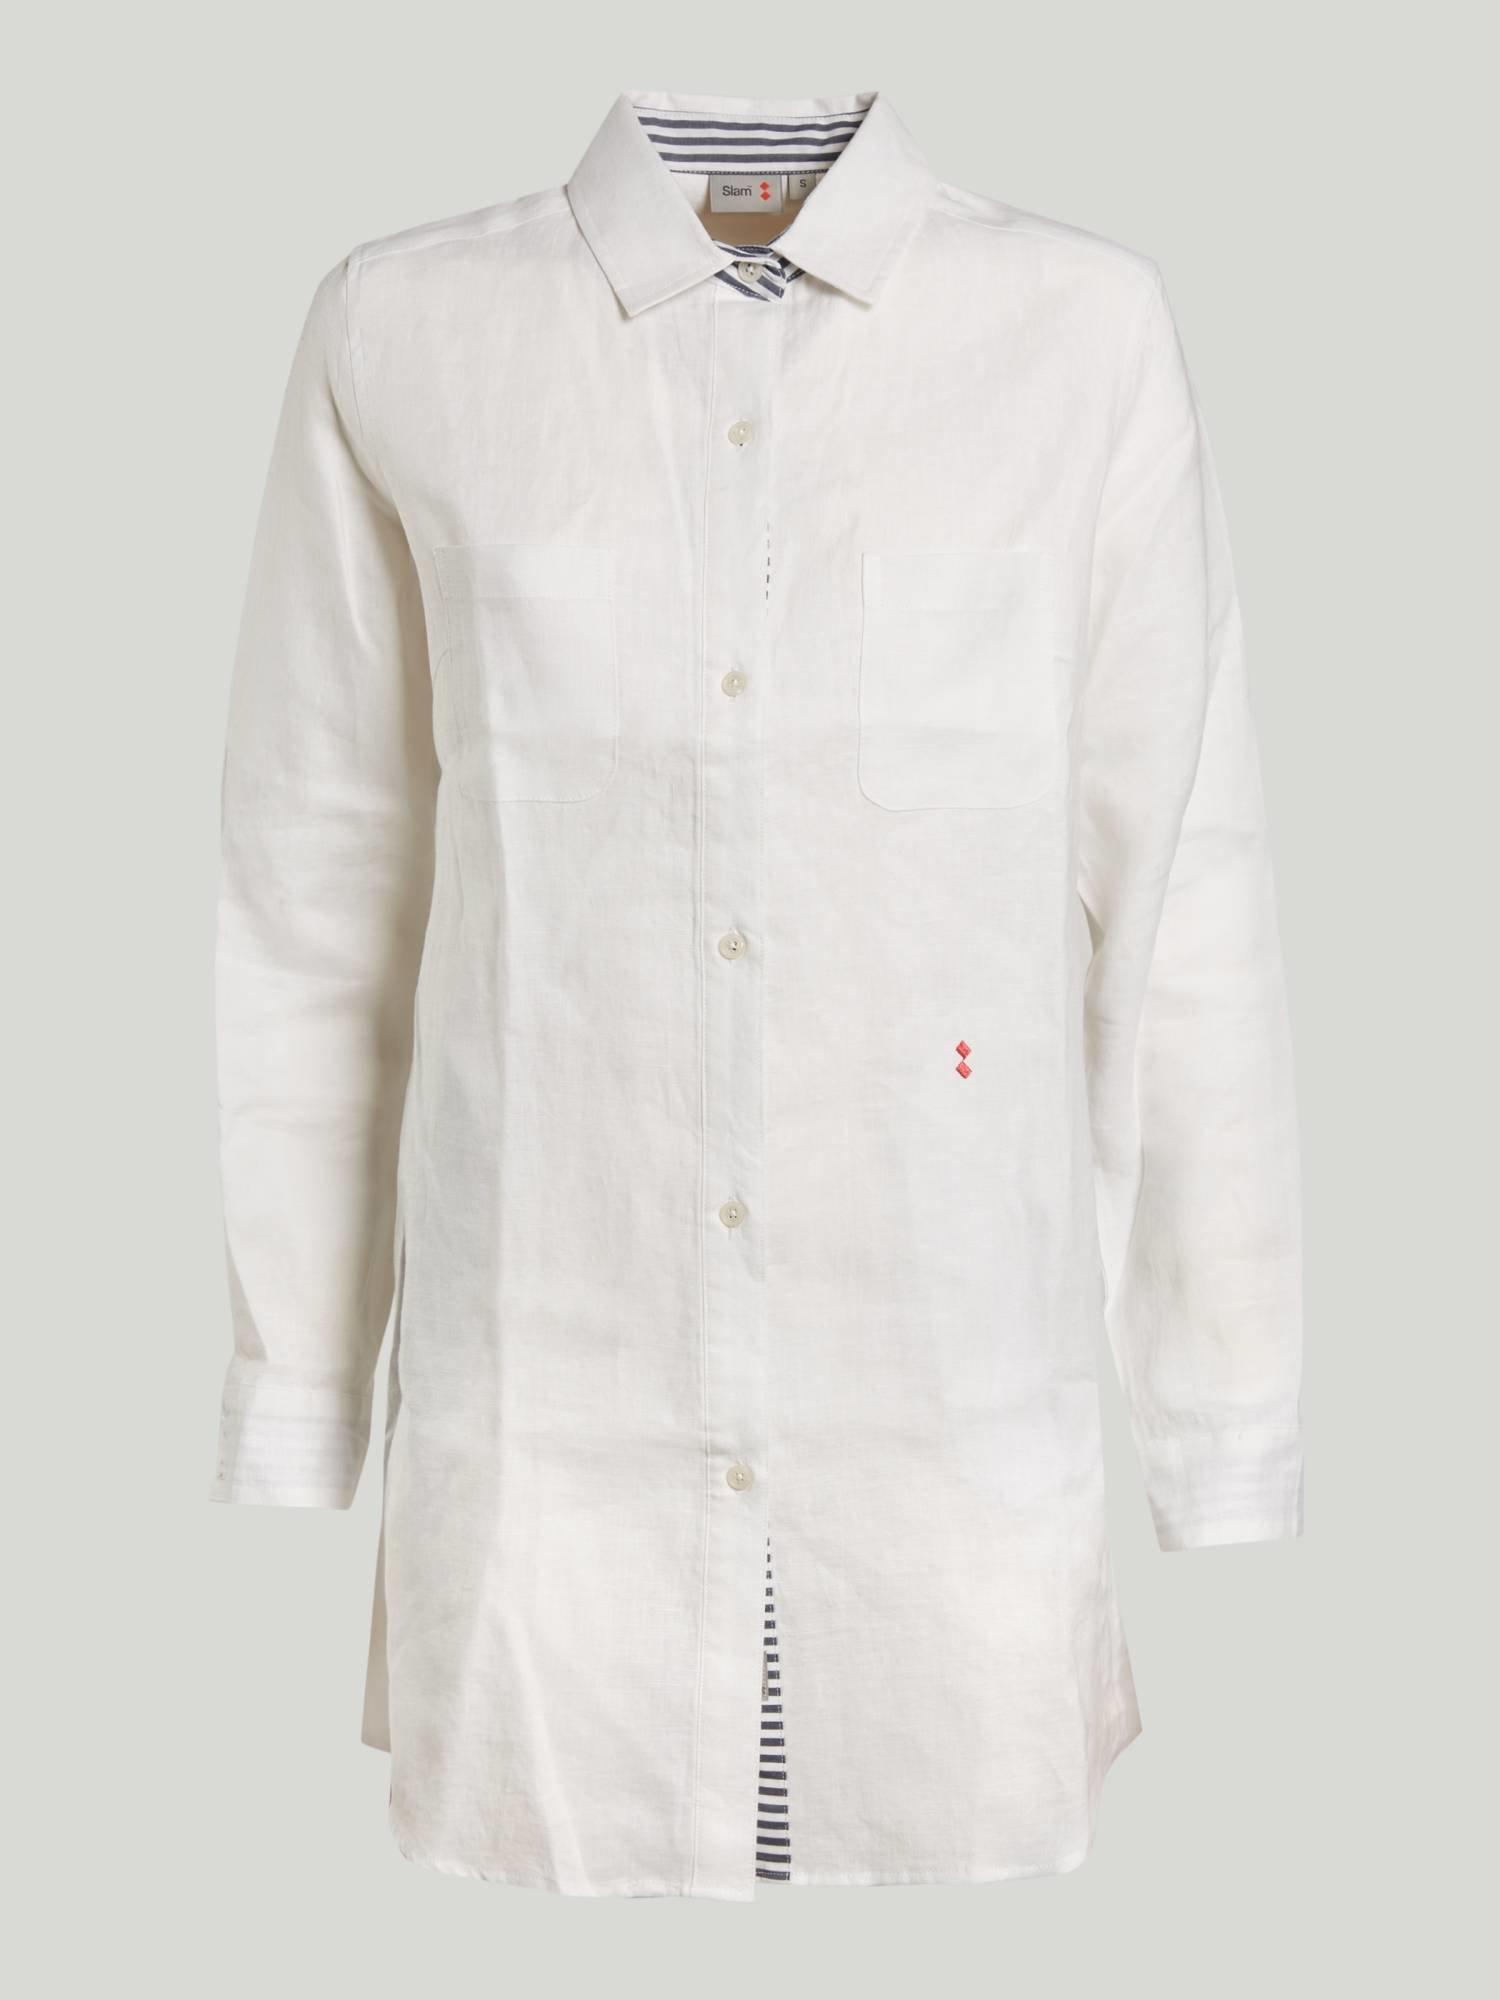 DRESS A168 - Bianco